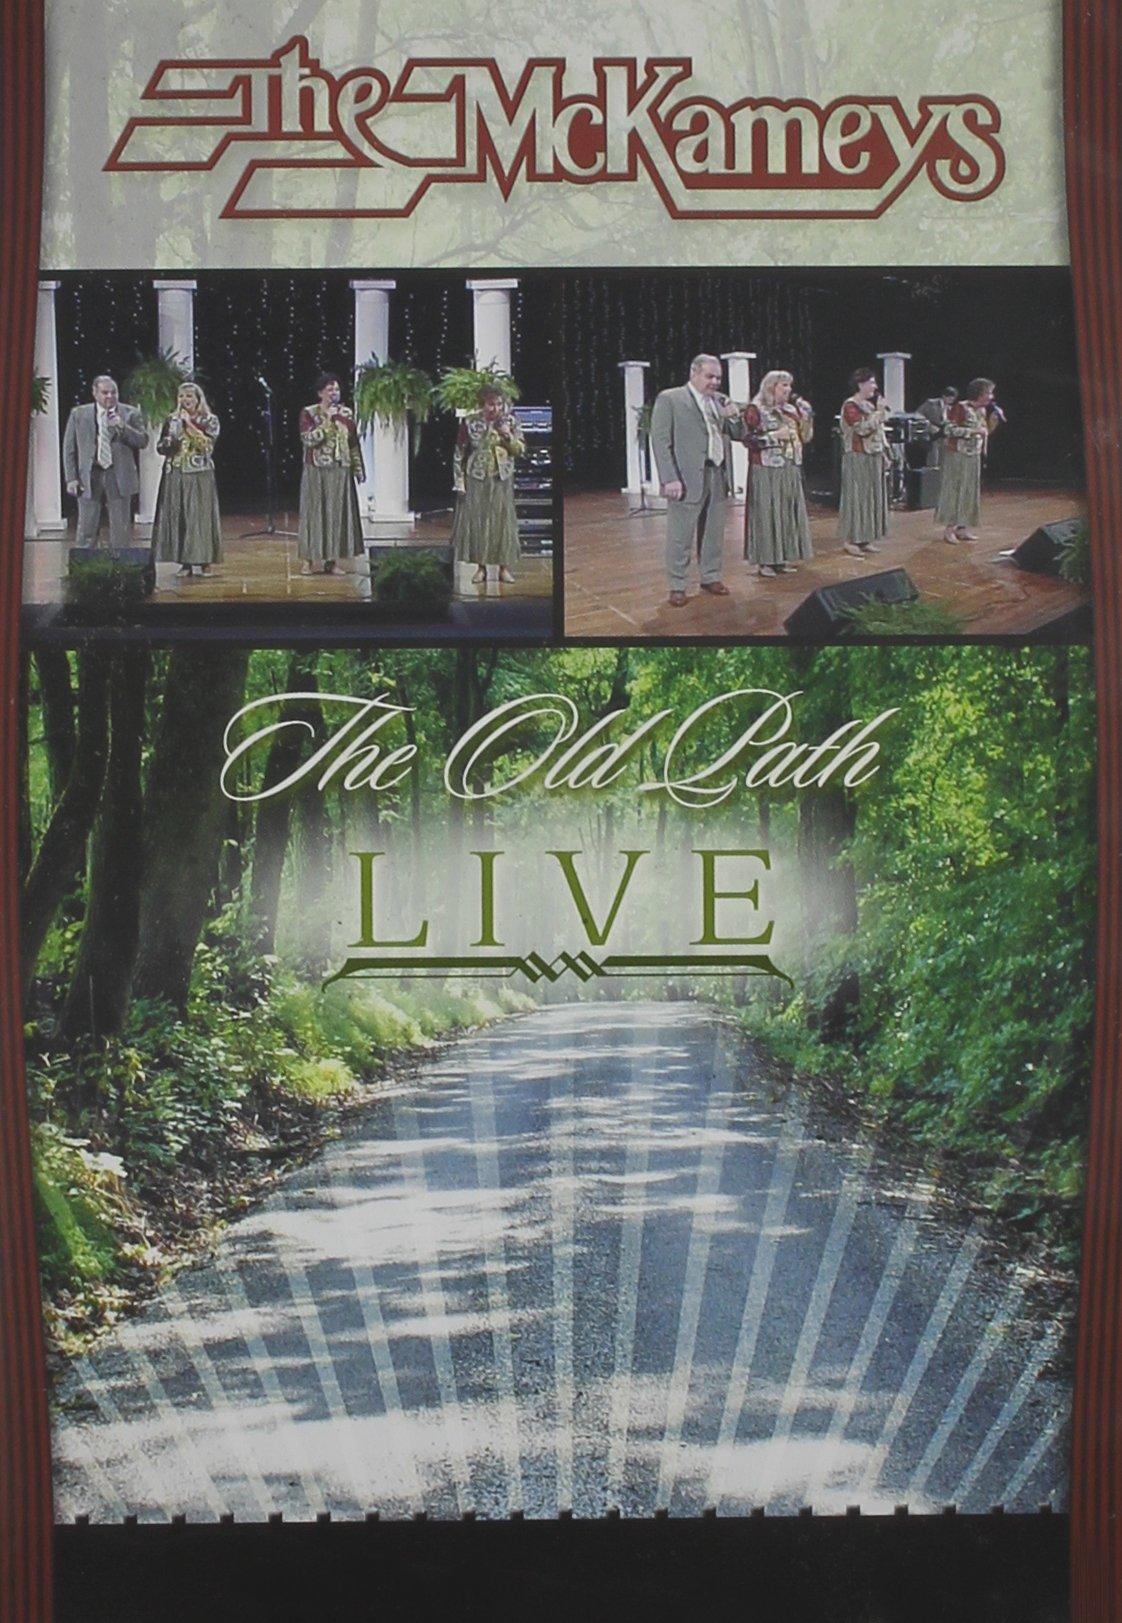 The McKameys: Old Path Live